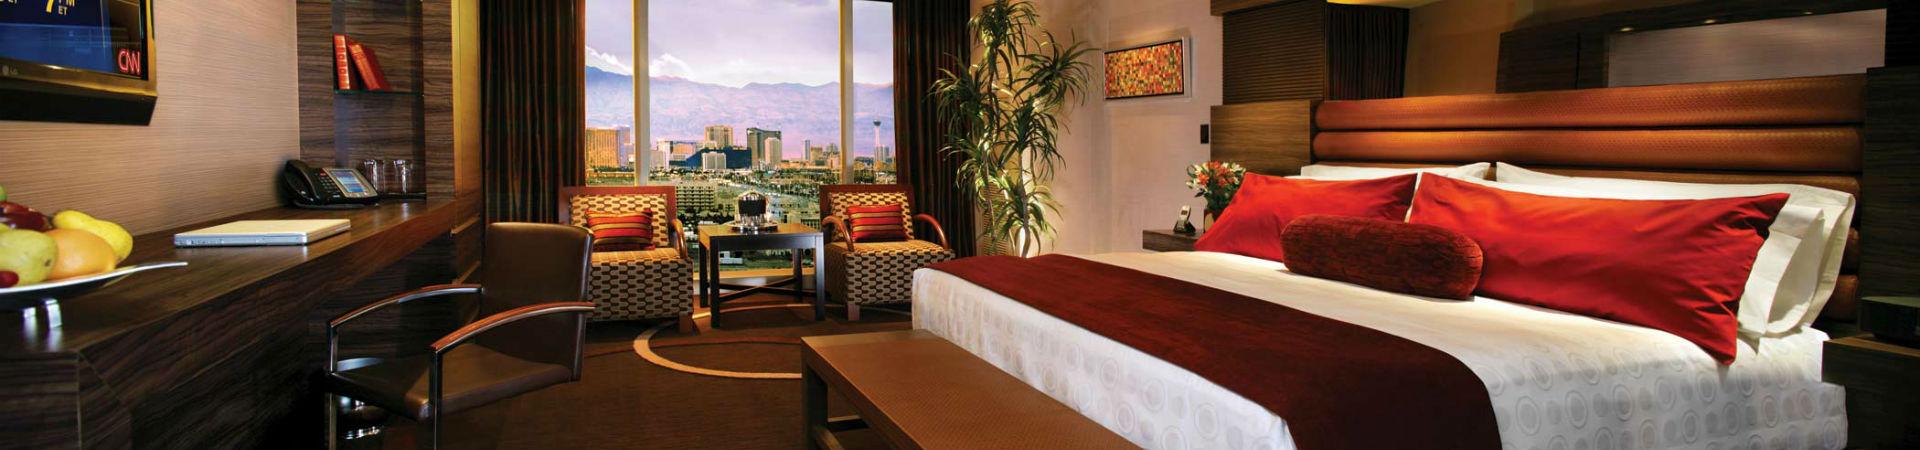 hotelslider3